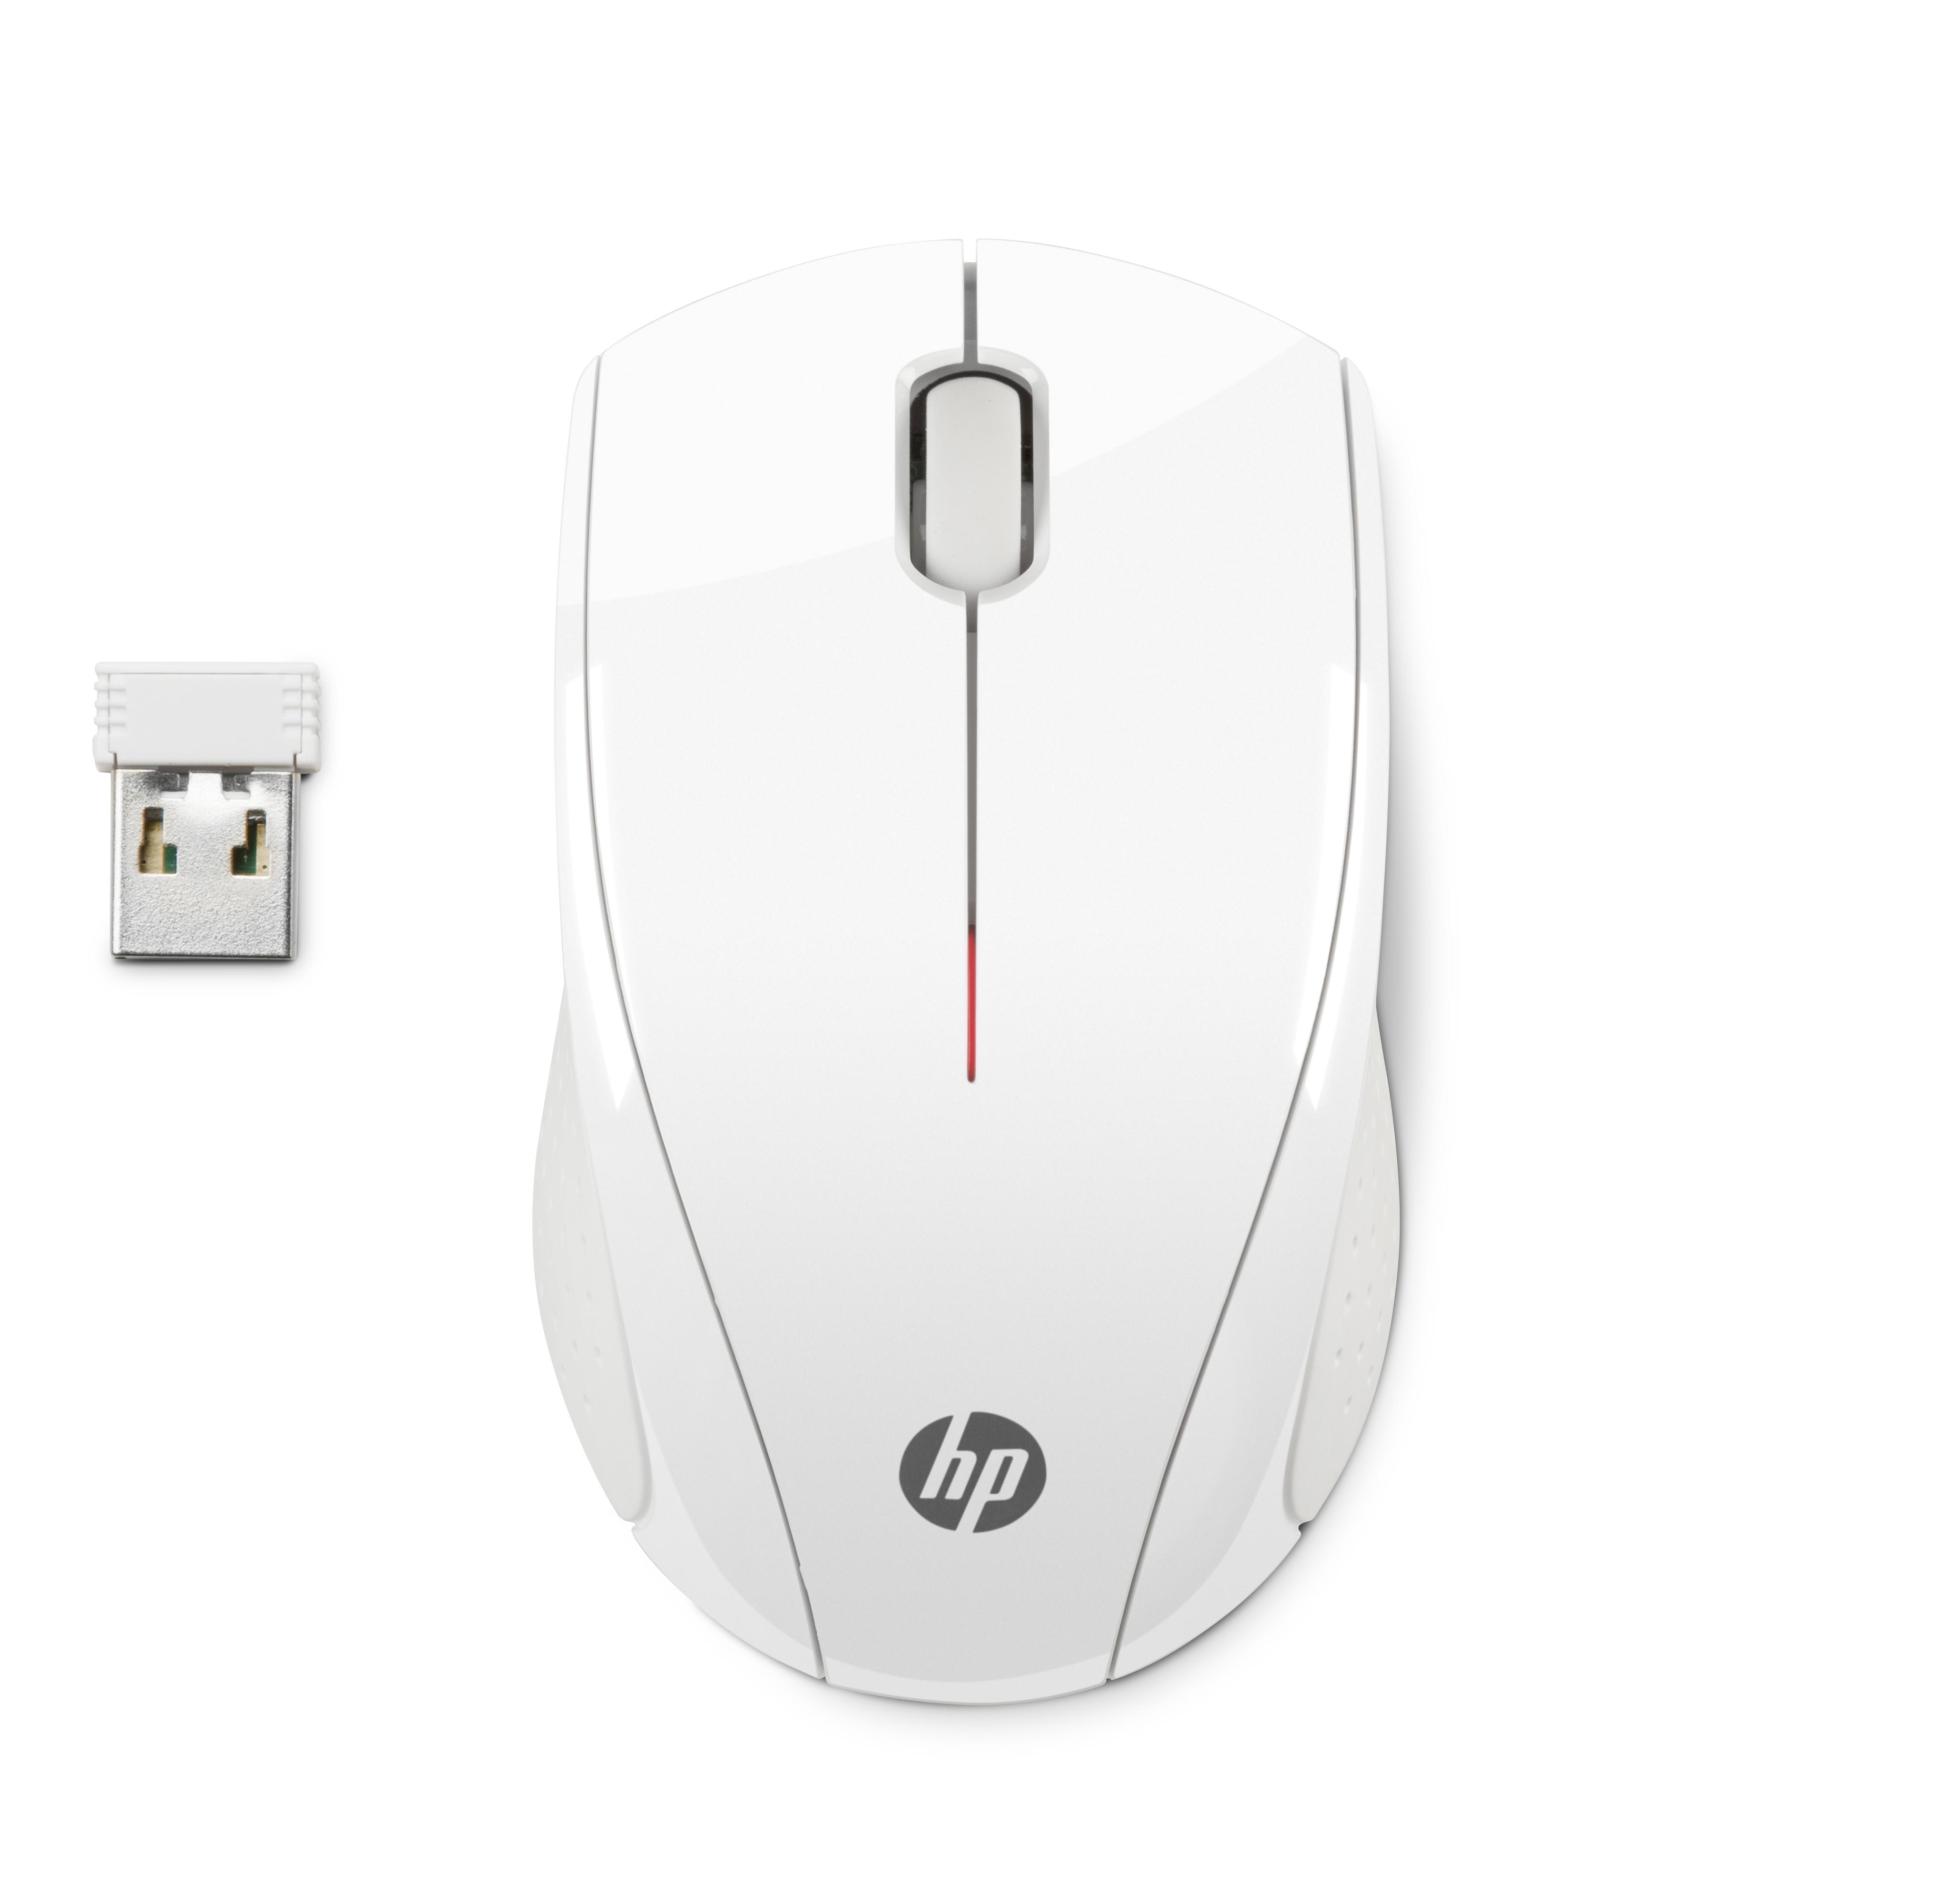 HP X3000 White Wireless Mouse RF Optisch 1200DPI Ambidextros Weiss Maus